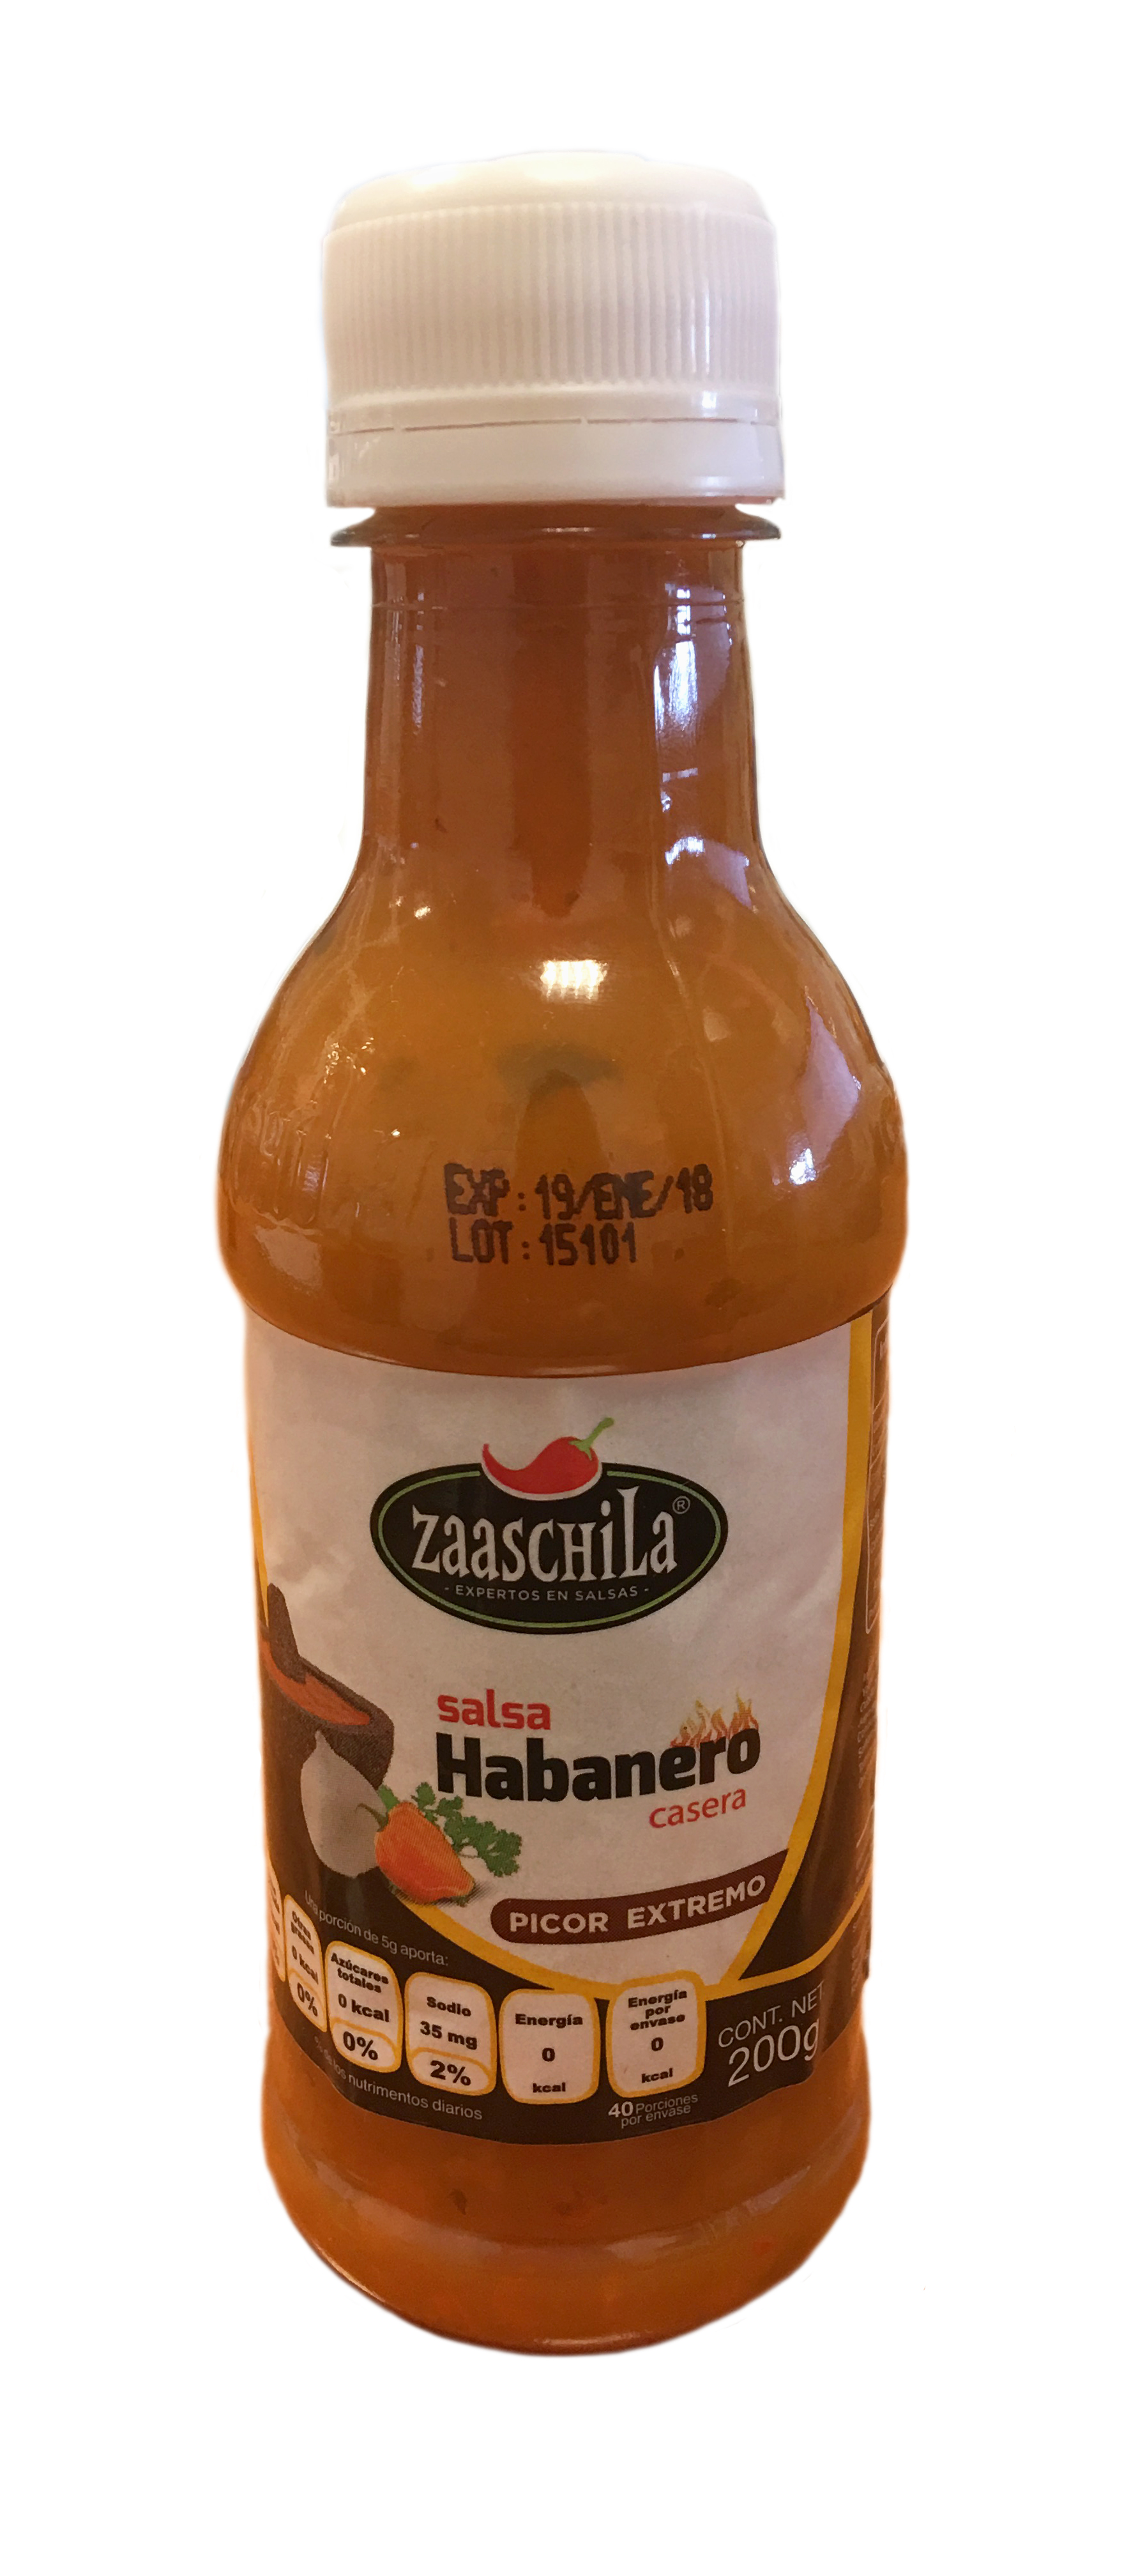 Salsa cremosa Habanera Zaaschila 200g botella de plastico